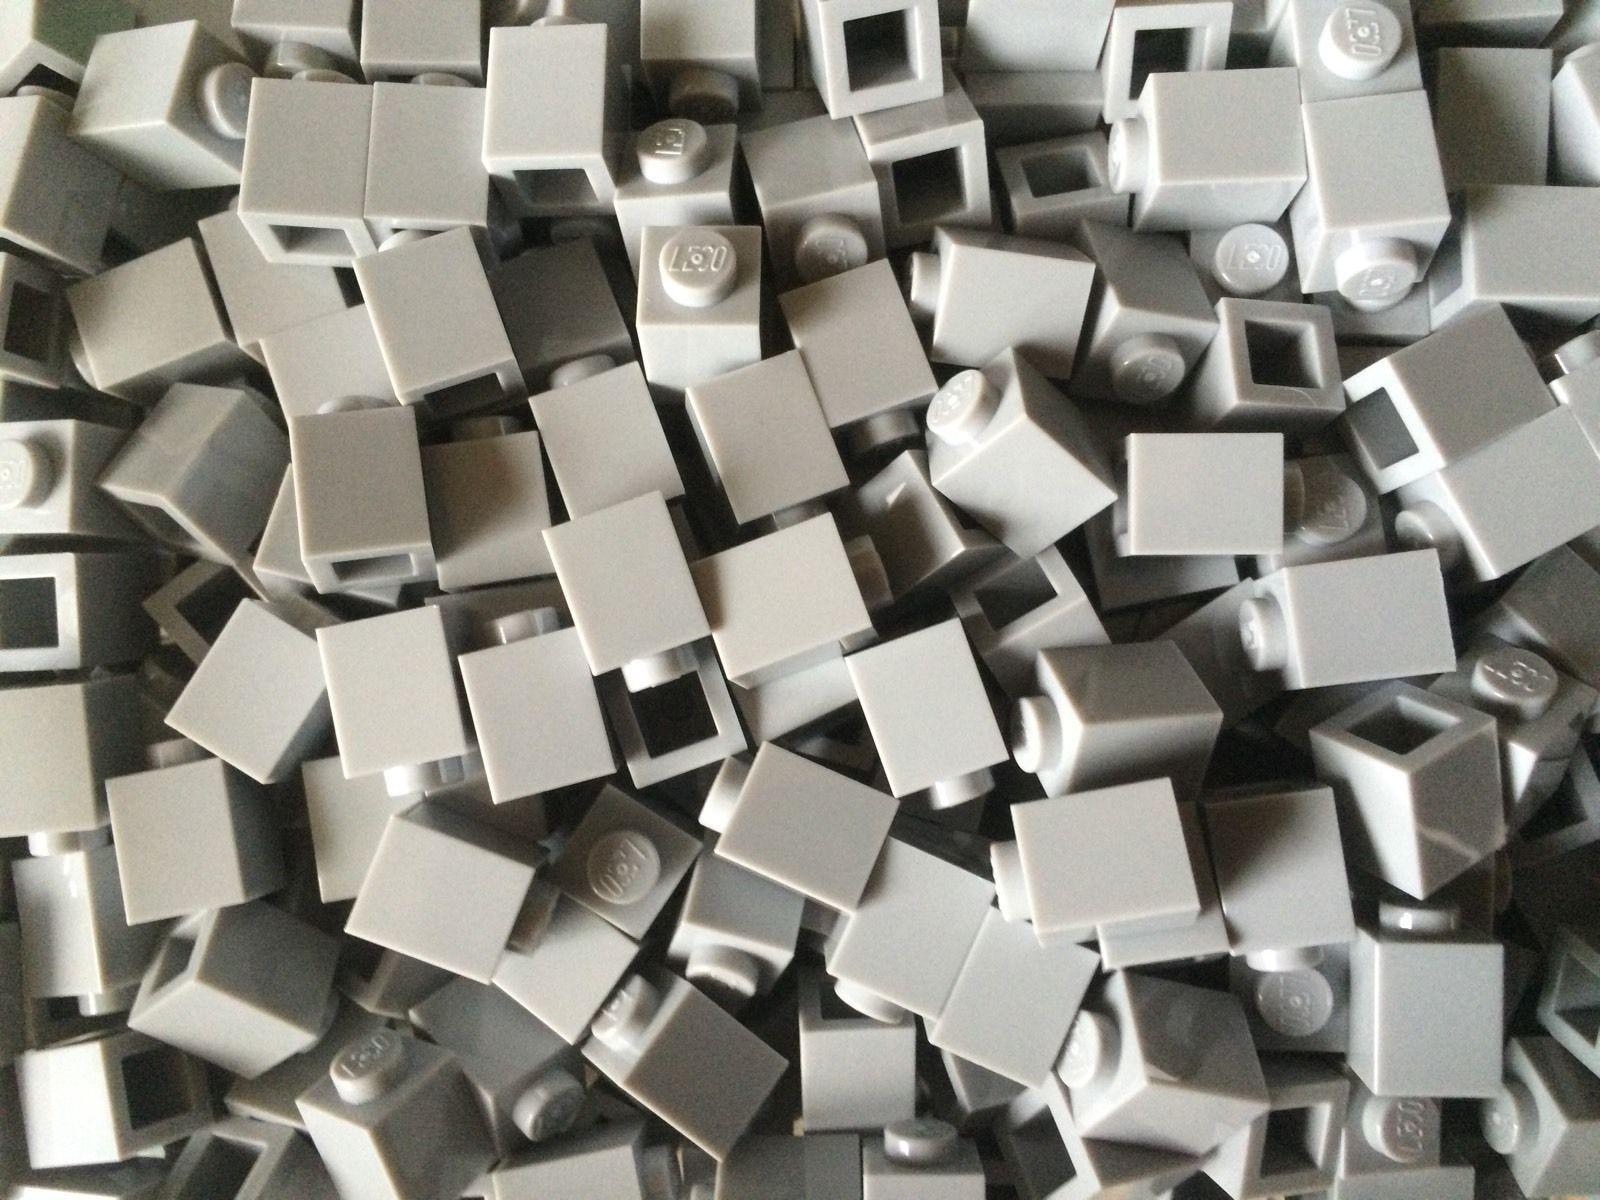 New Lego Part 3005 1x1 Pin Brick (20 Medium Stone Grey Pieces) https://t.co/jHGS5UHakR https://t.co/fVmH3lUutj